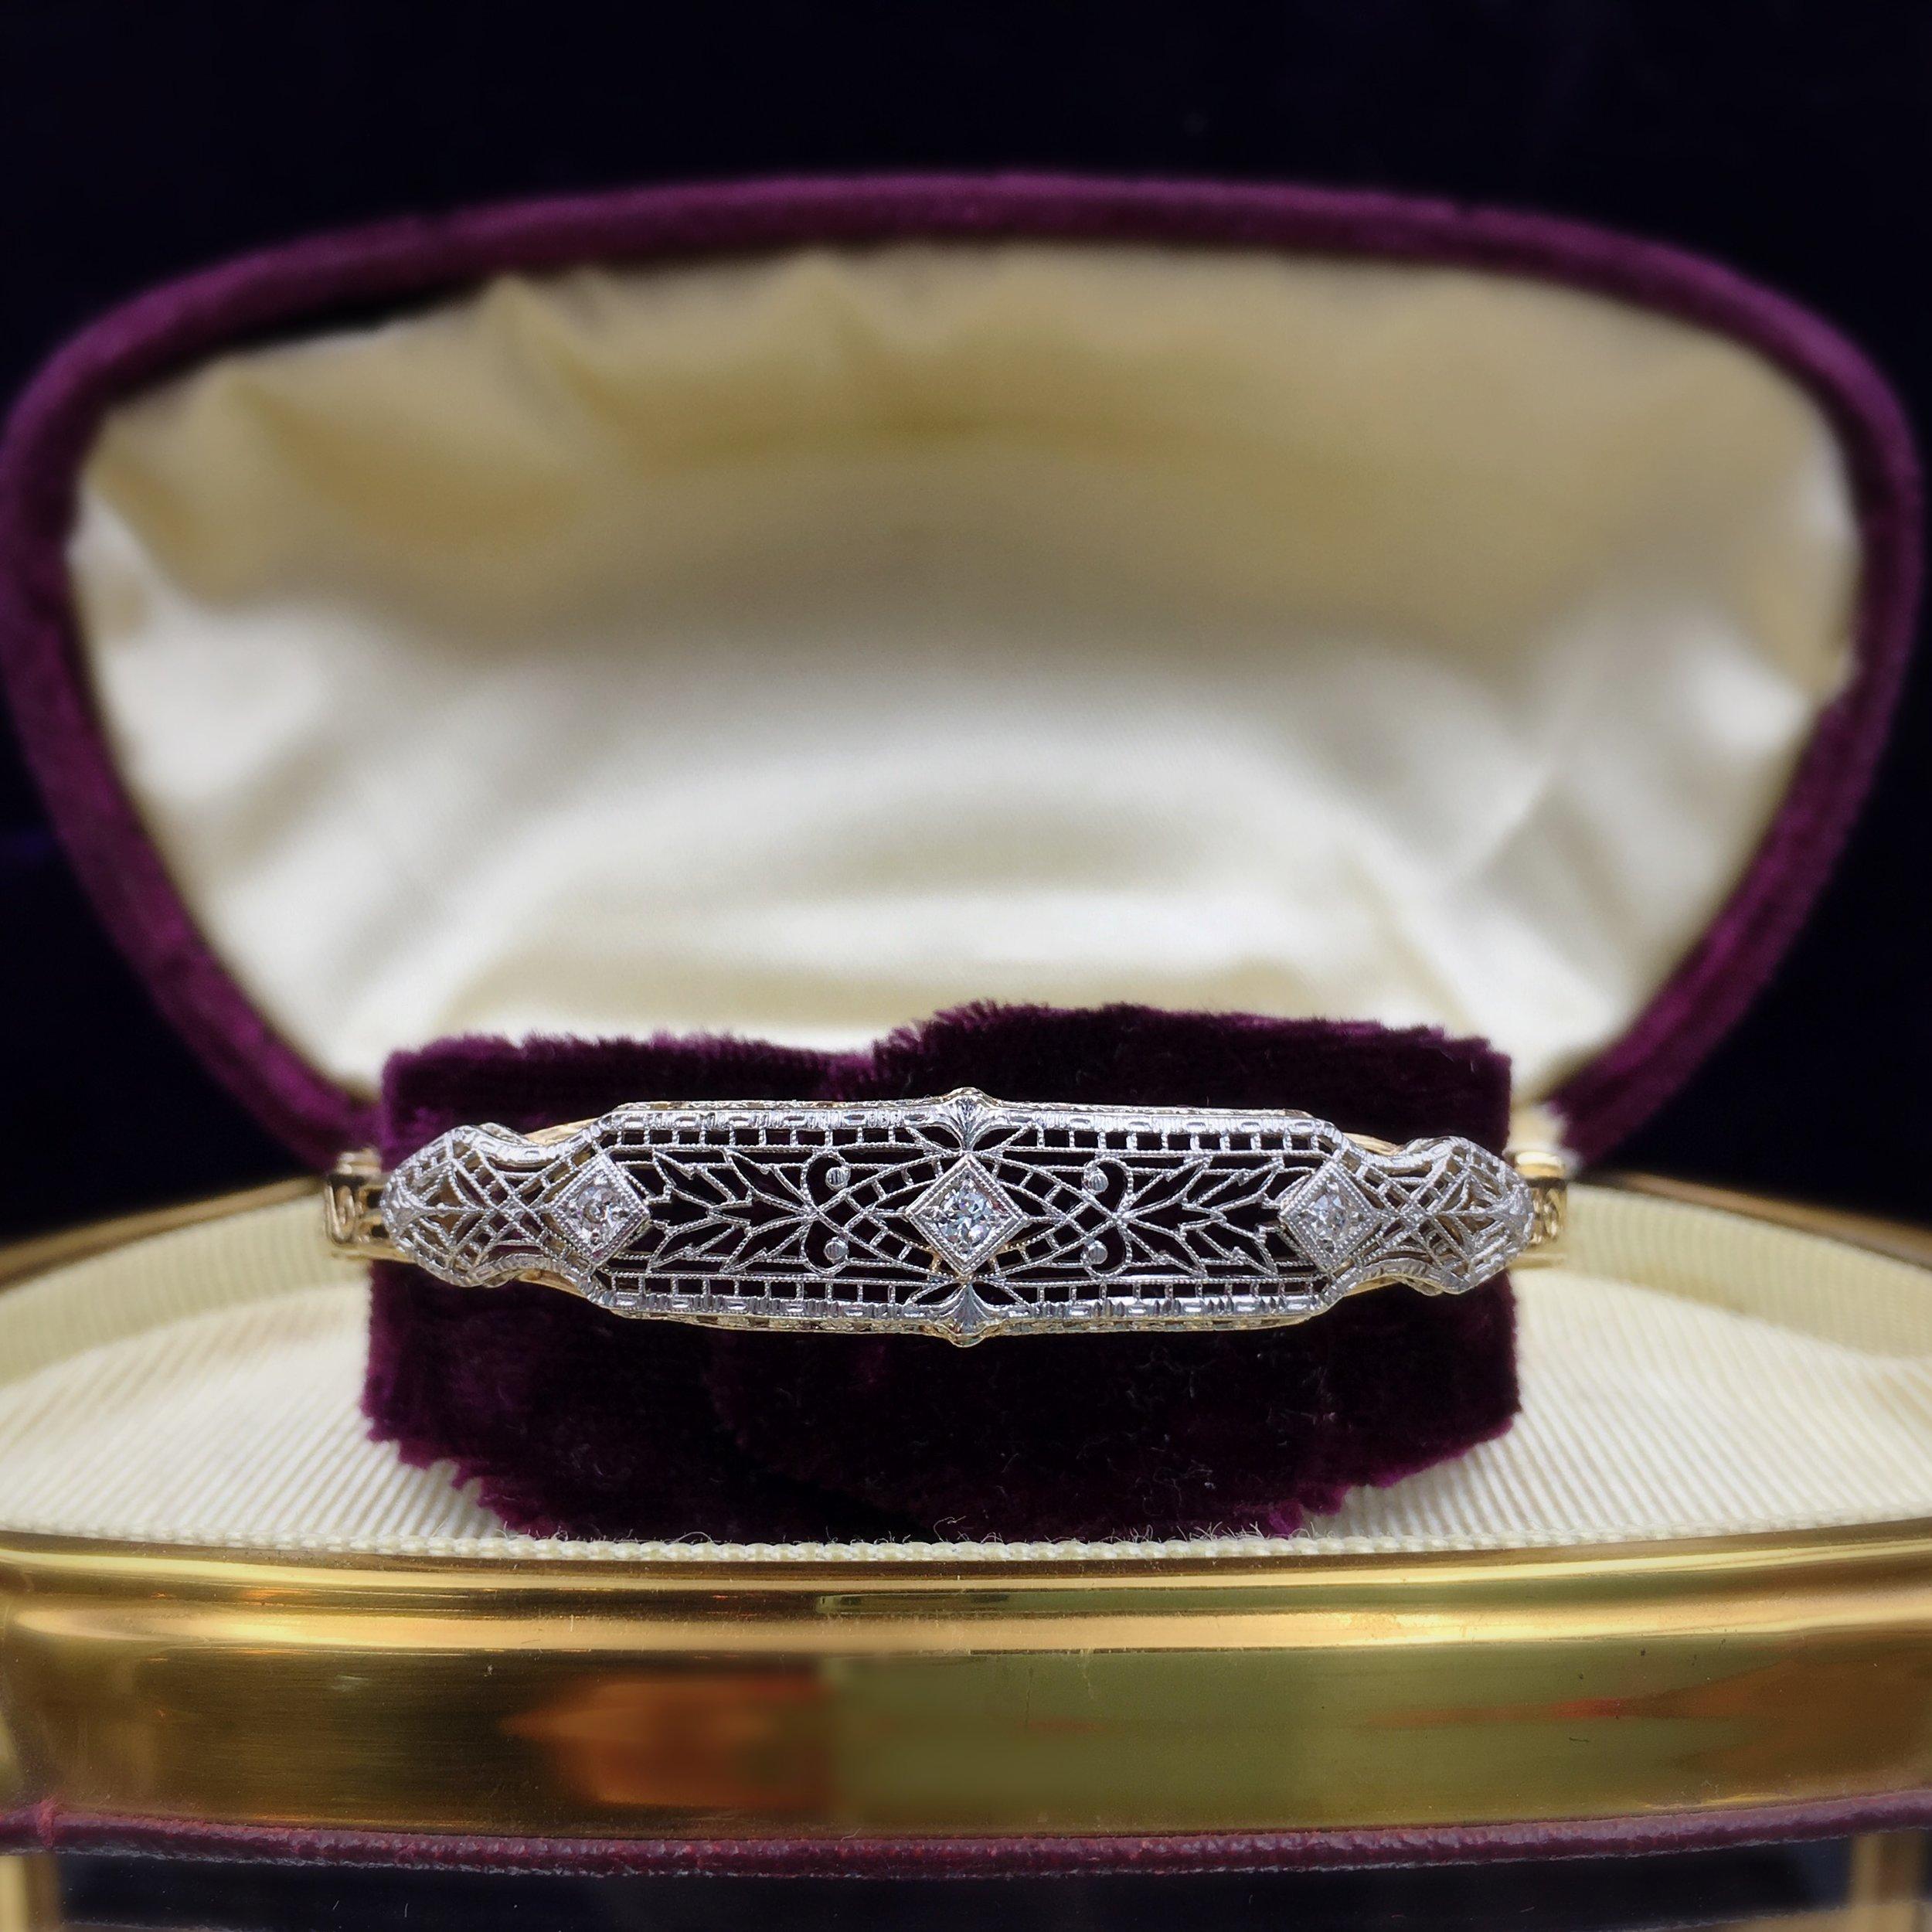 Deco filigree bracelet, Reverie vintage jewelry NYC